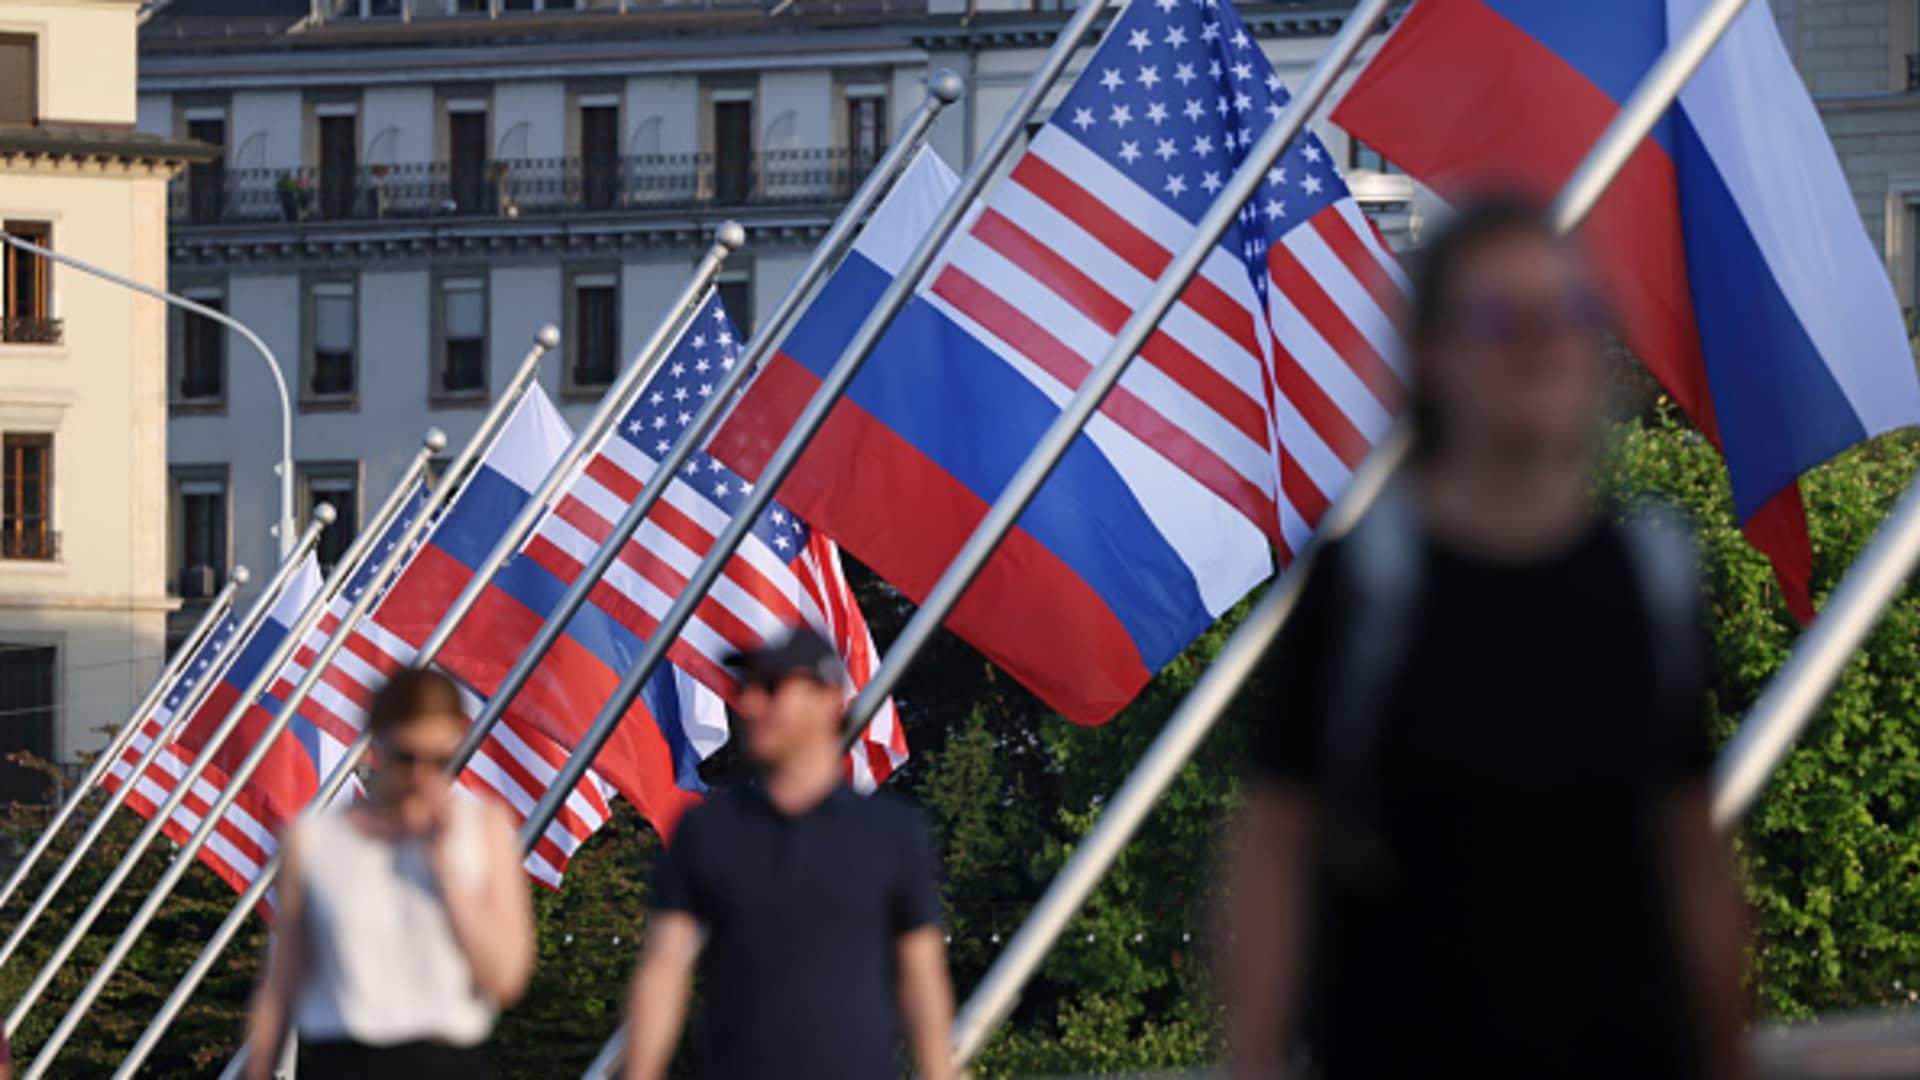 People walk under Russian and American flags on a bridge in the city center prior to a meeting between U.S. President, Joe Biden and Russian President, Vladimir Putin on June 15, 2021 in Geneva, Switzerland.